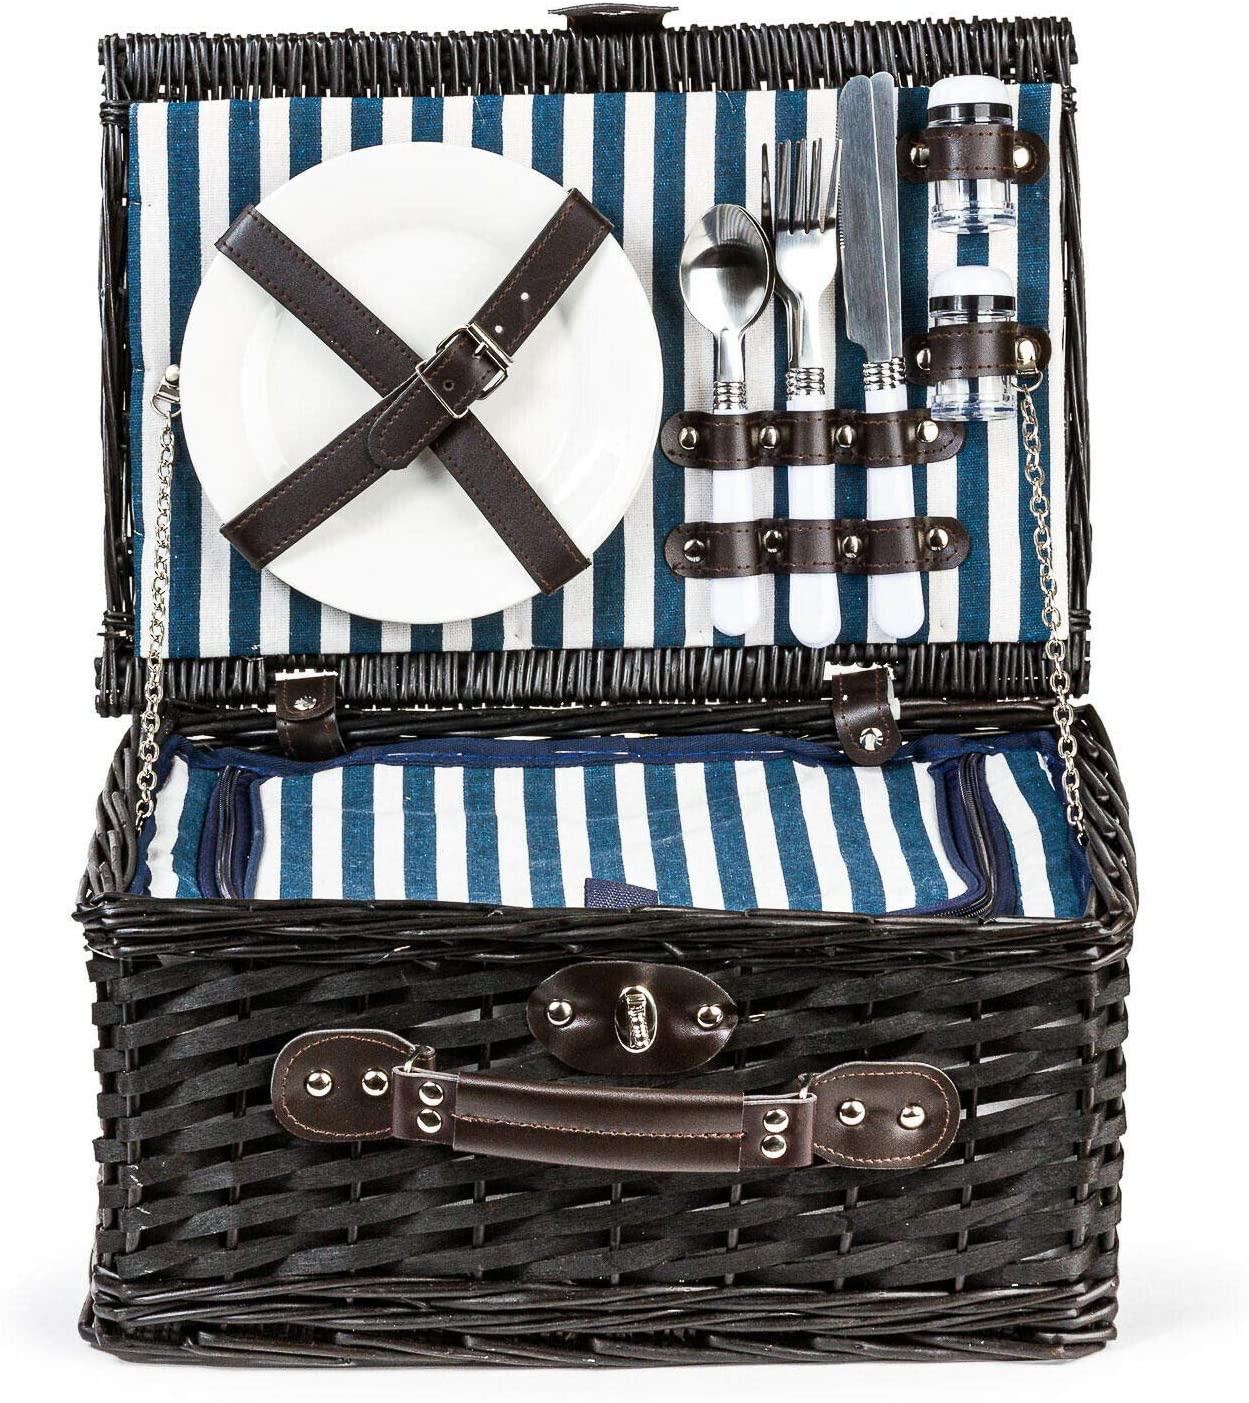 Rantepao - Dark Wicker Cooler Picnic Basket Gift Set for 2 Plates Cups Utensils Blue Stripe